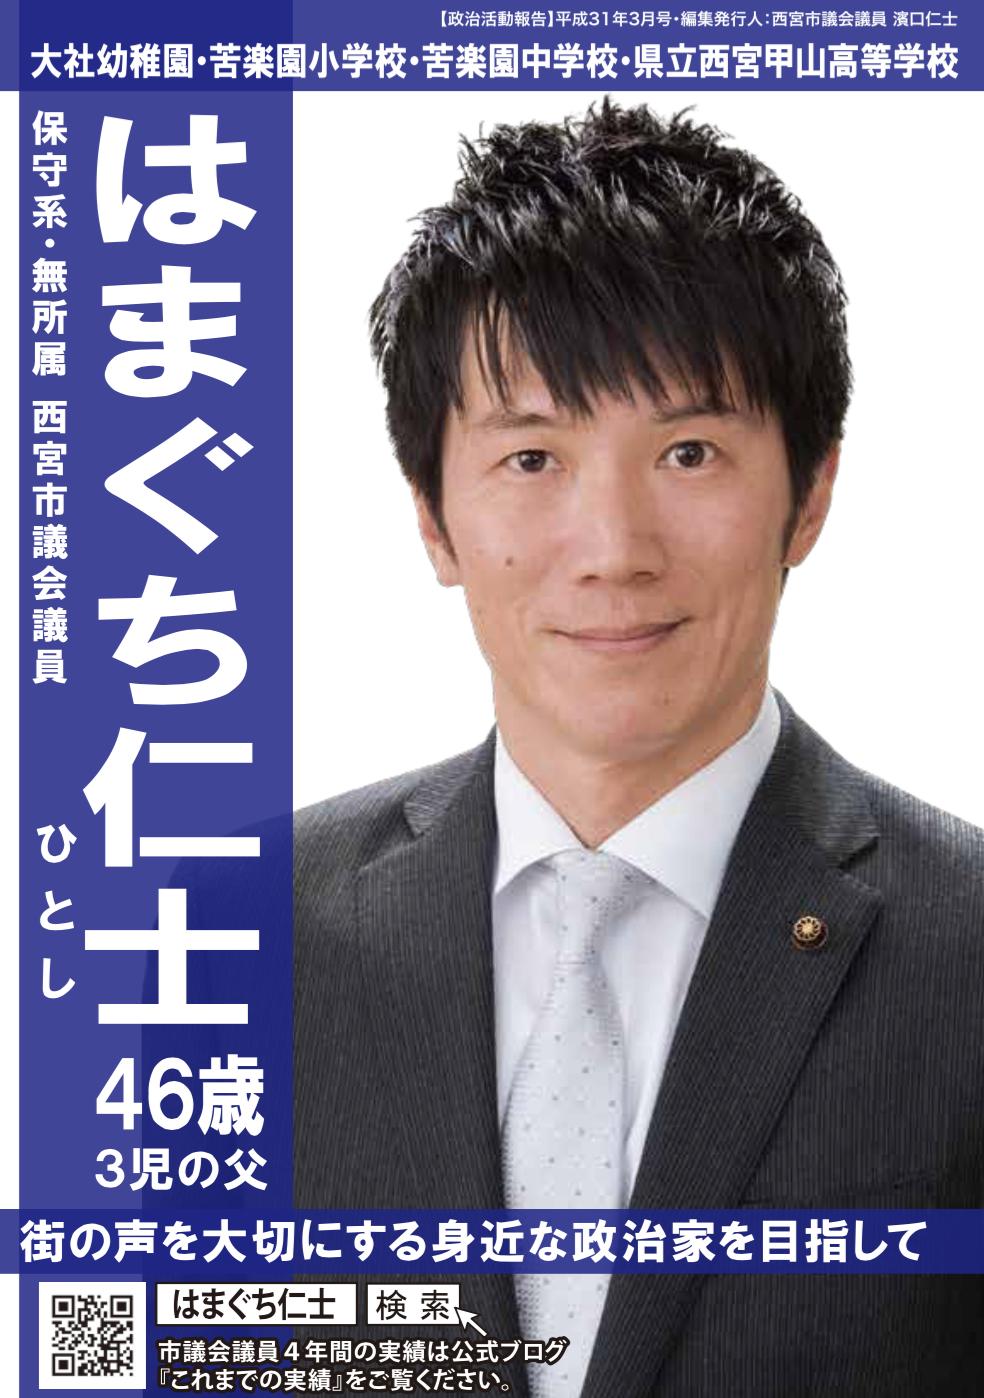 2019年3月政治活動報告